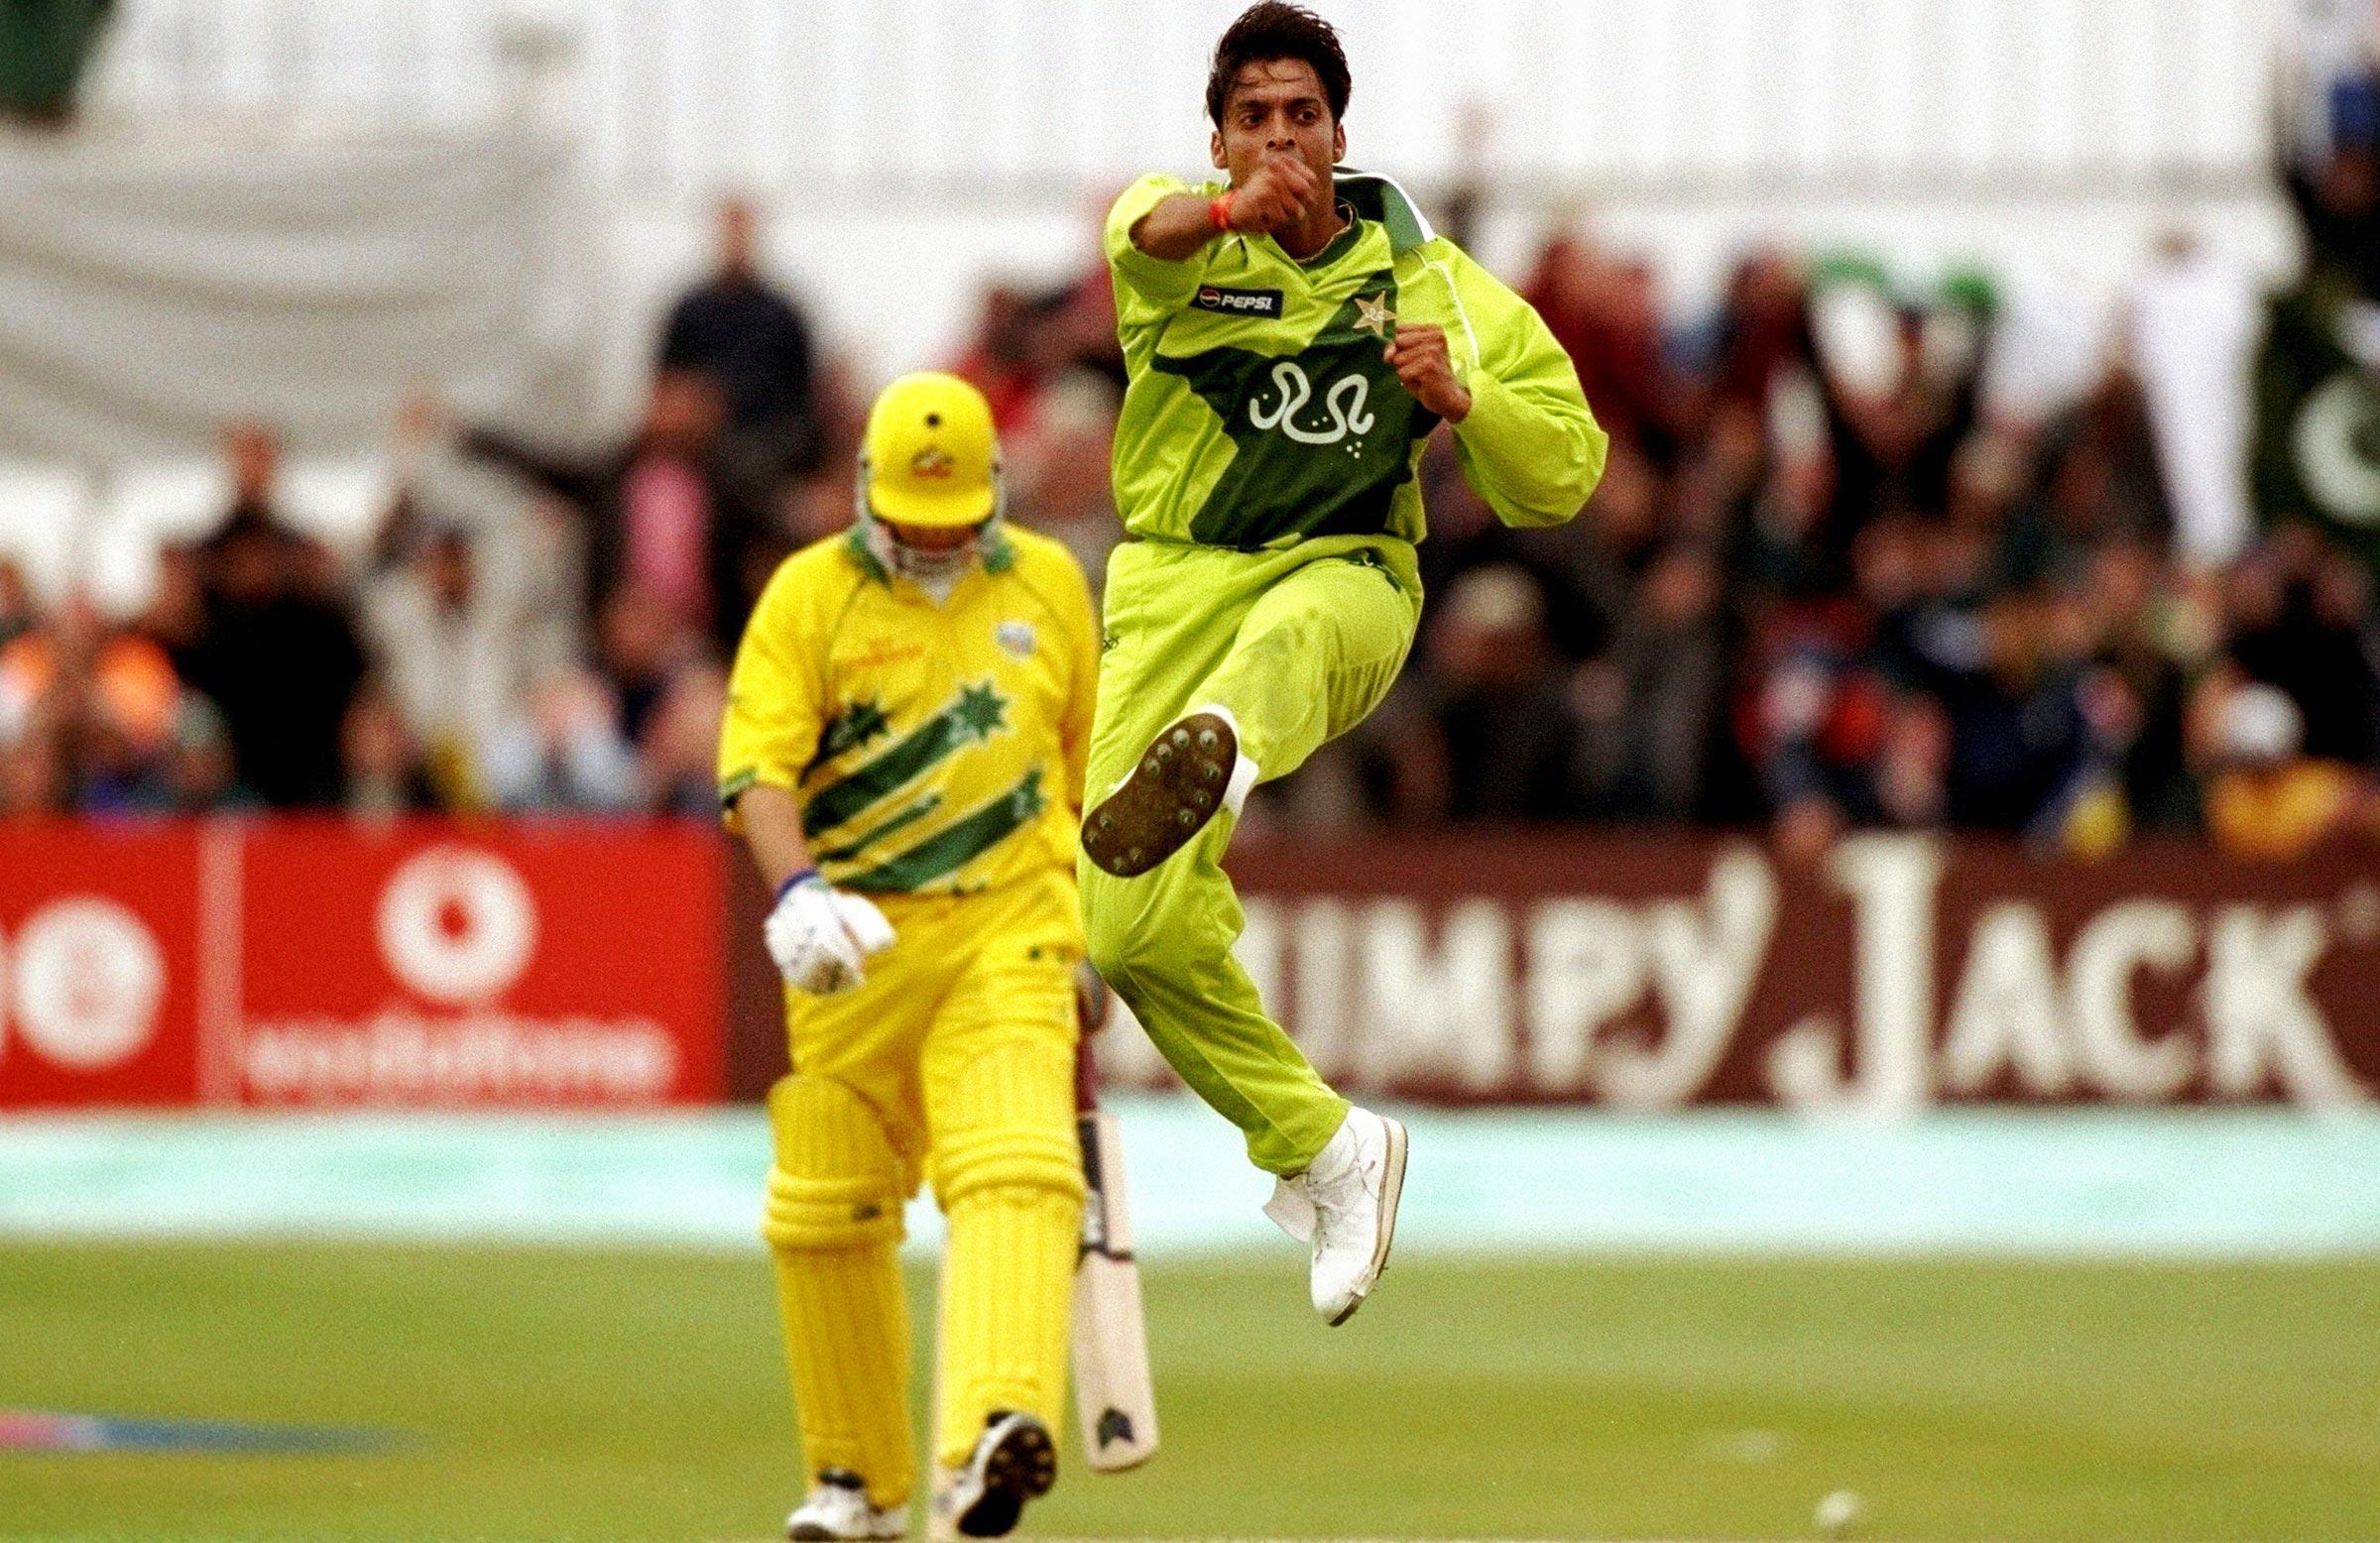 Shoaib Akhtar celebrates a wicket at Headlingley // Getty